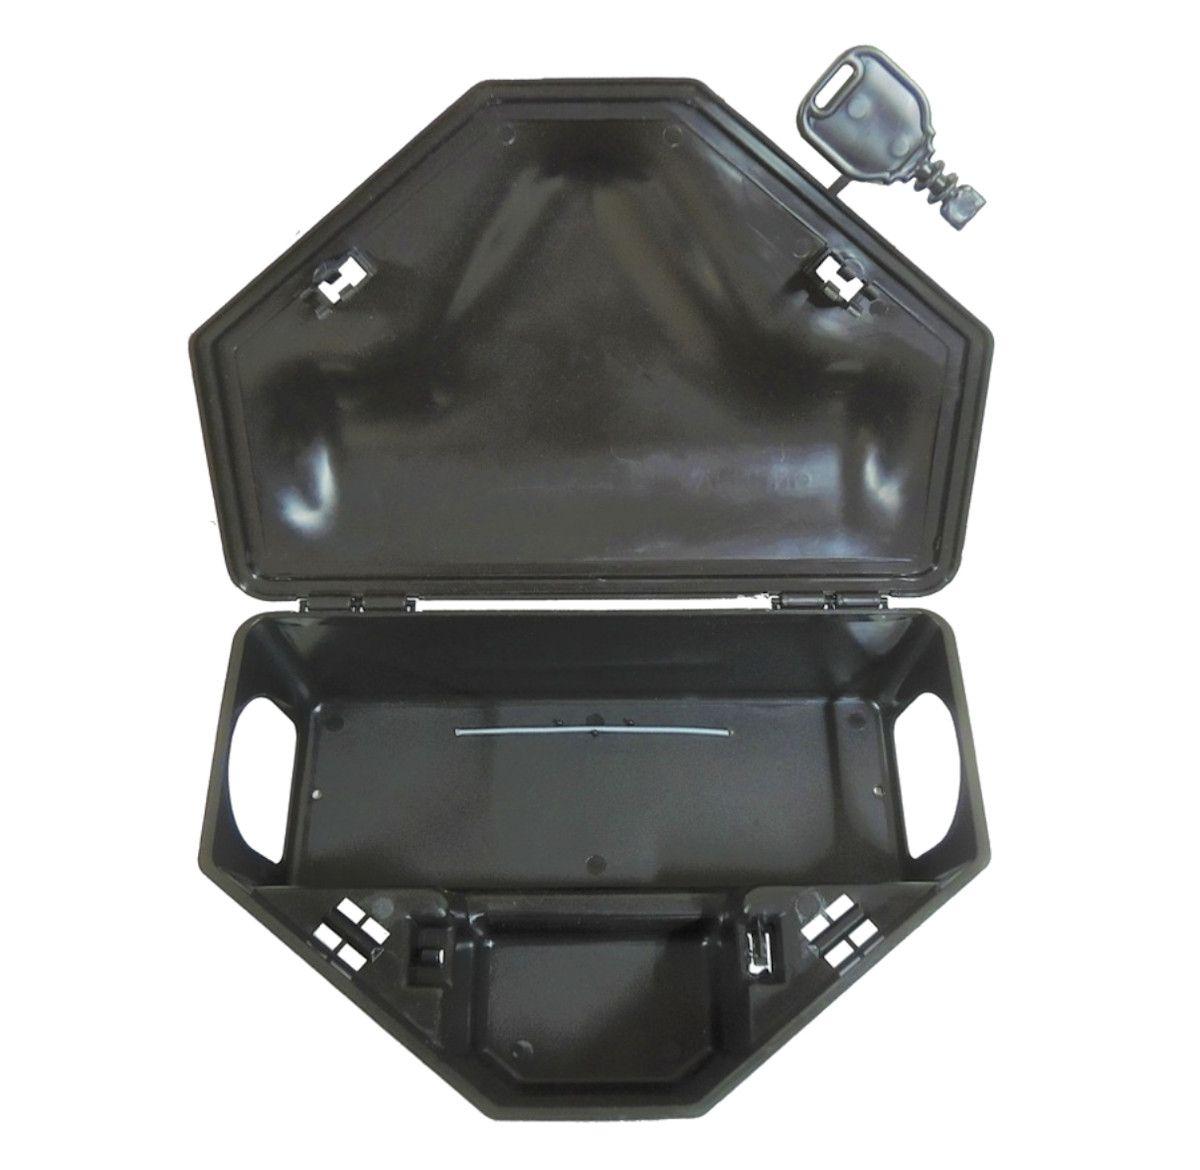 Kit 24 Porta Isca Com 2 Chaves - Duplo Travamento